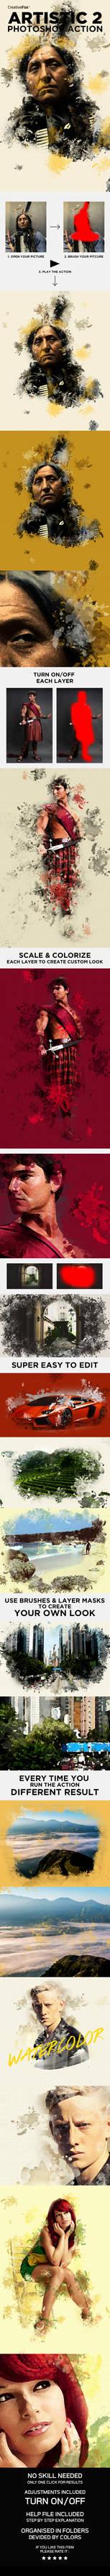 Artistic 2 Photoshop Action - Watercolor Effect